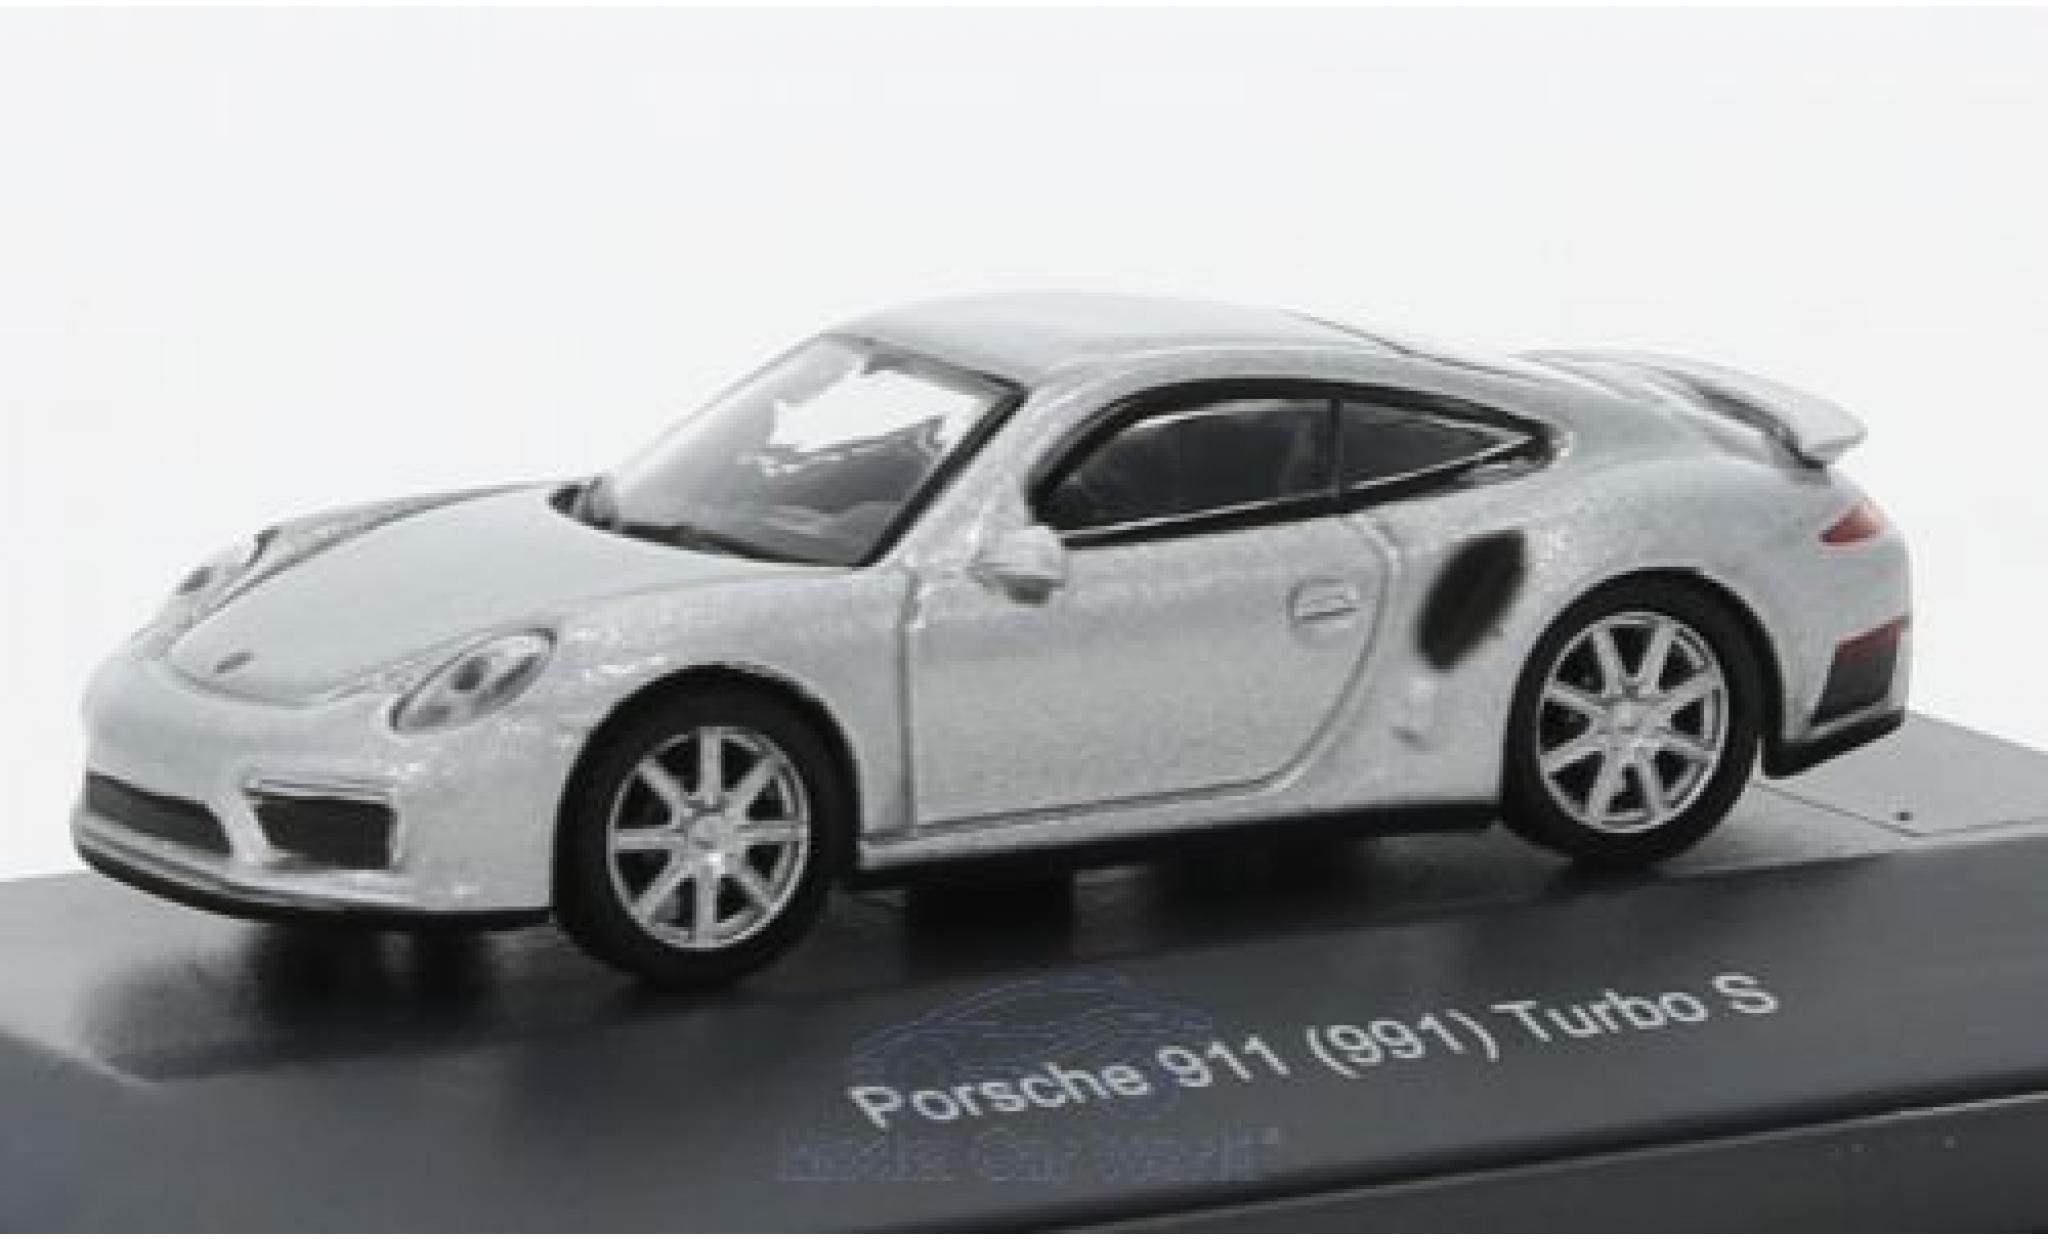 Porsche 991 Turbo 1/87 Schuco (991) Turbo S grey